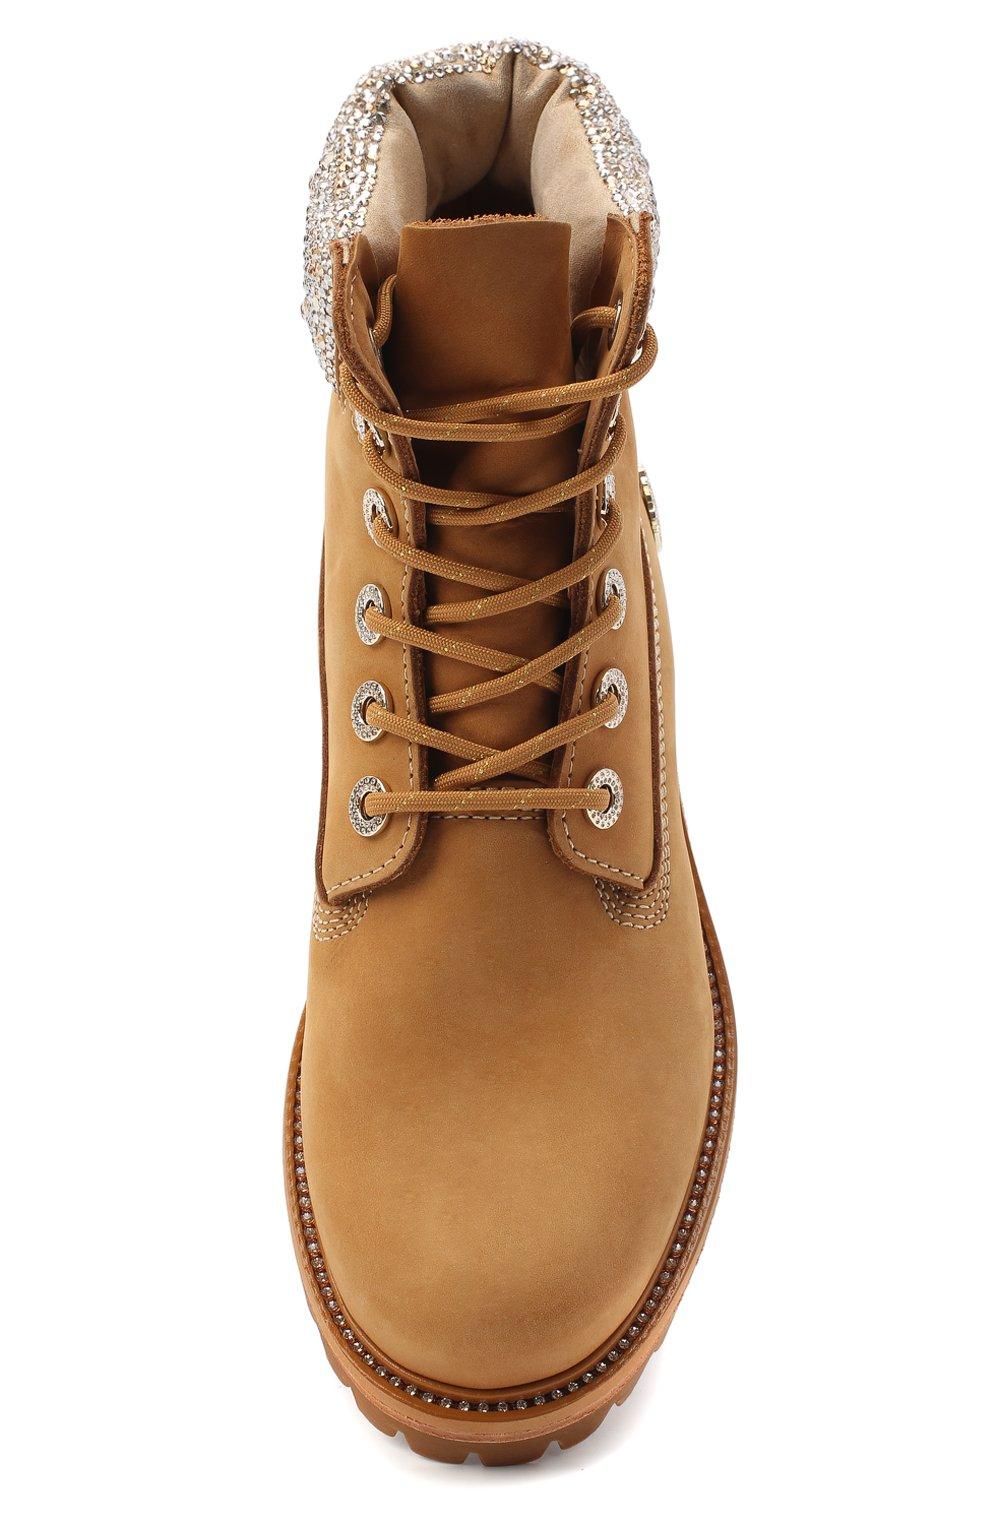 Женские кожаные ботинки jc x timberland JIMMY CHOO бежевого цвета, арт. JC X TIMBERLAND/F/TNCL | Фото 5